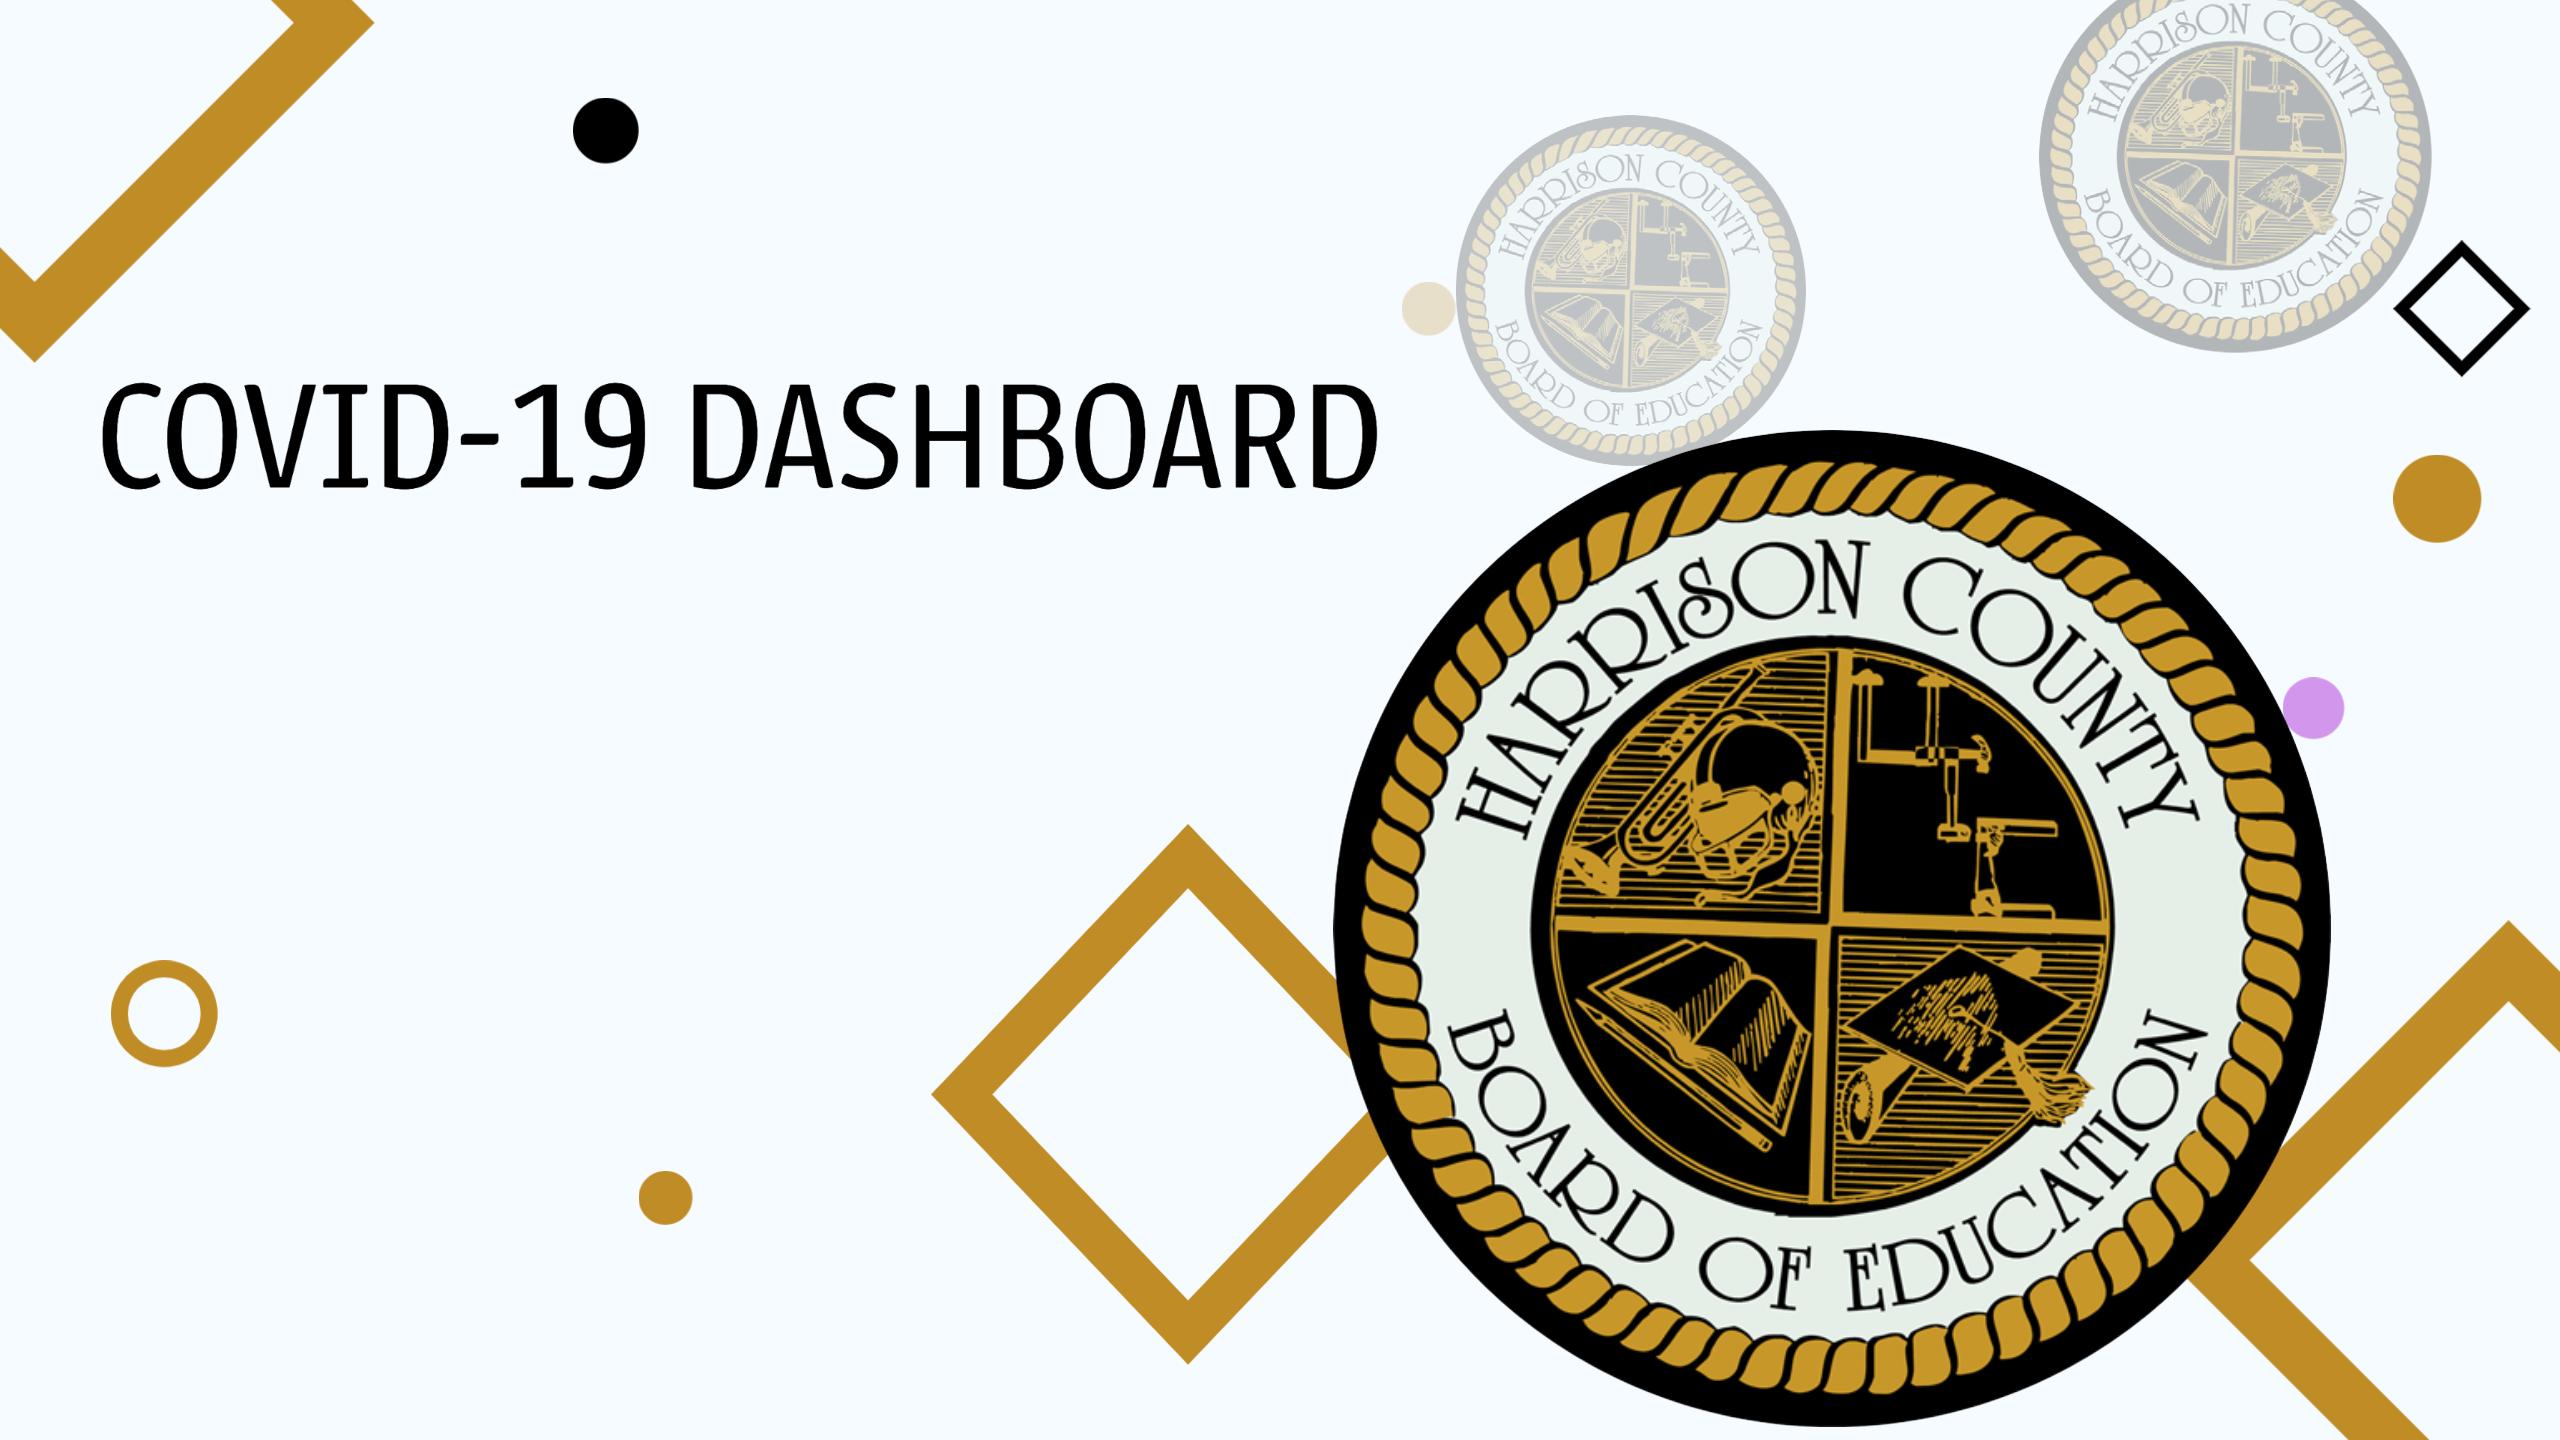 COVID Dashboard